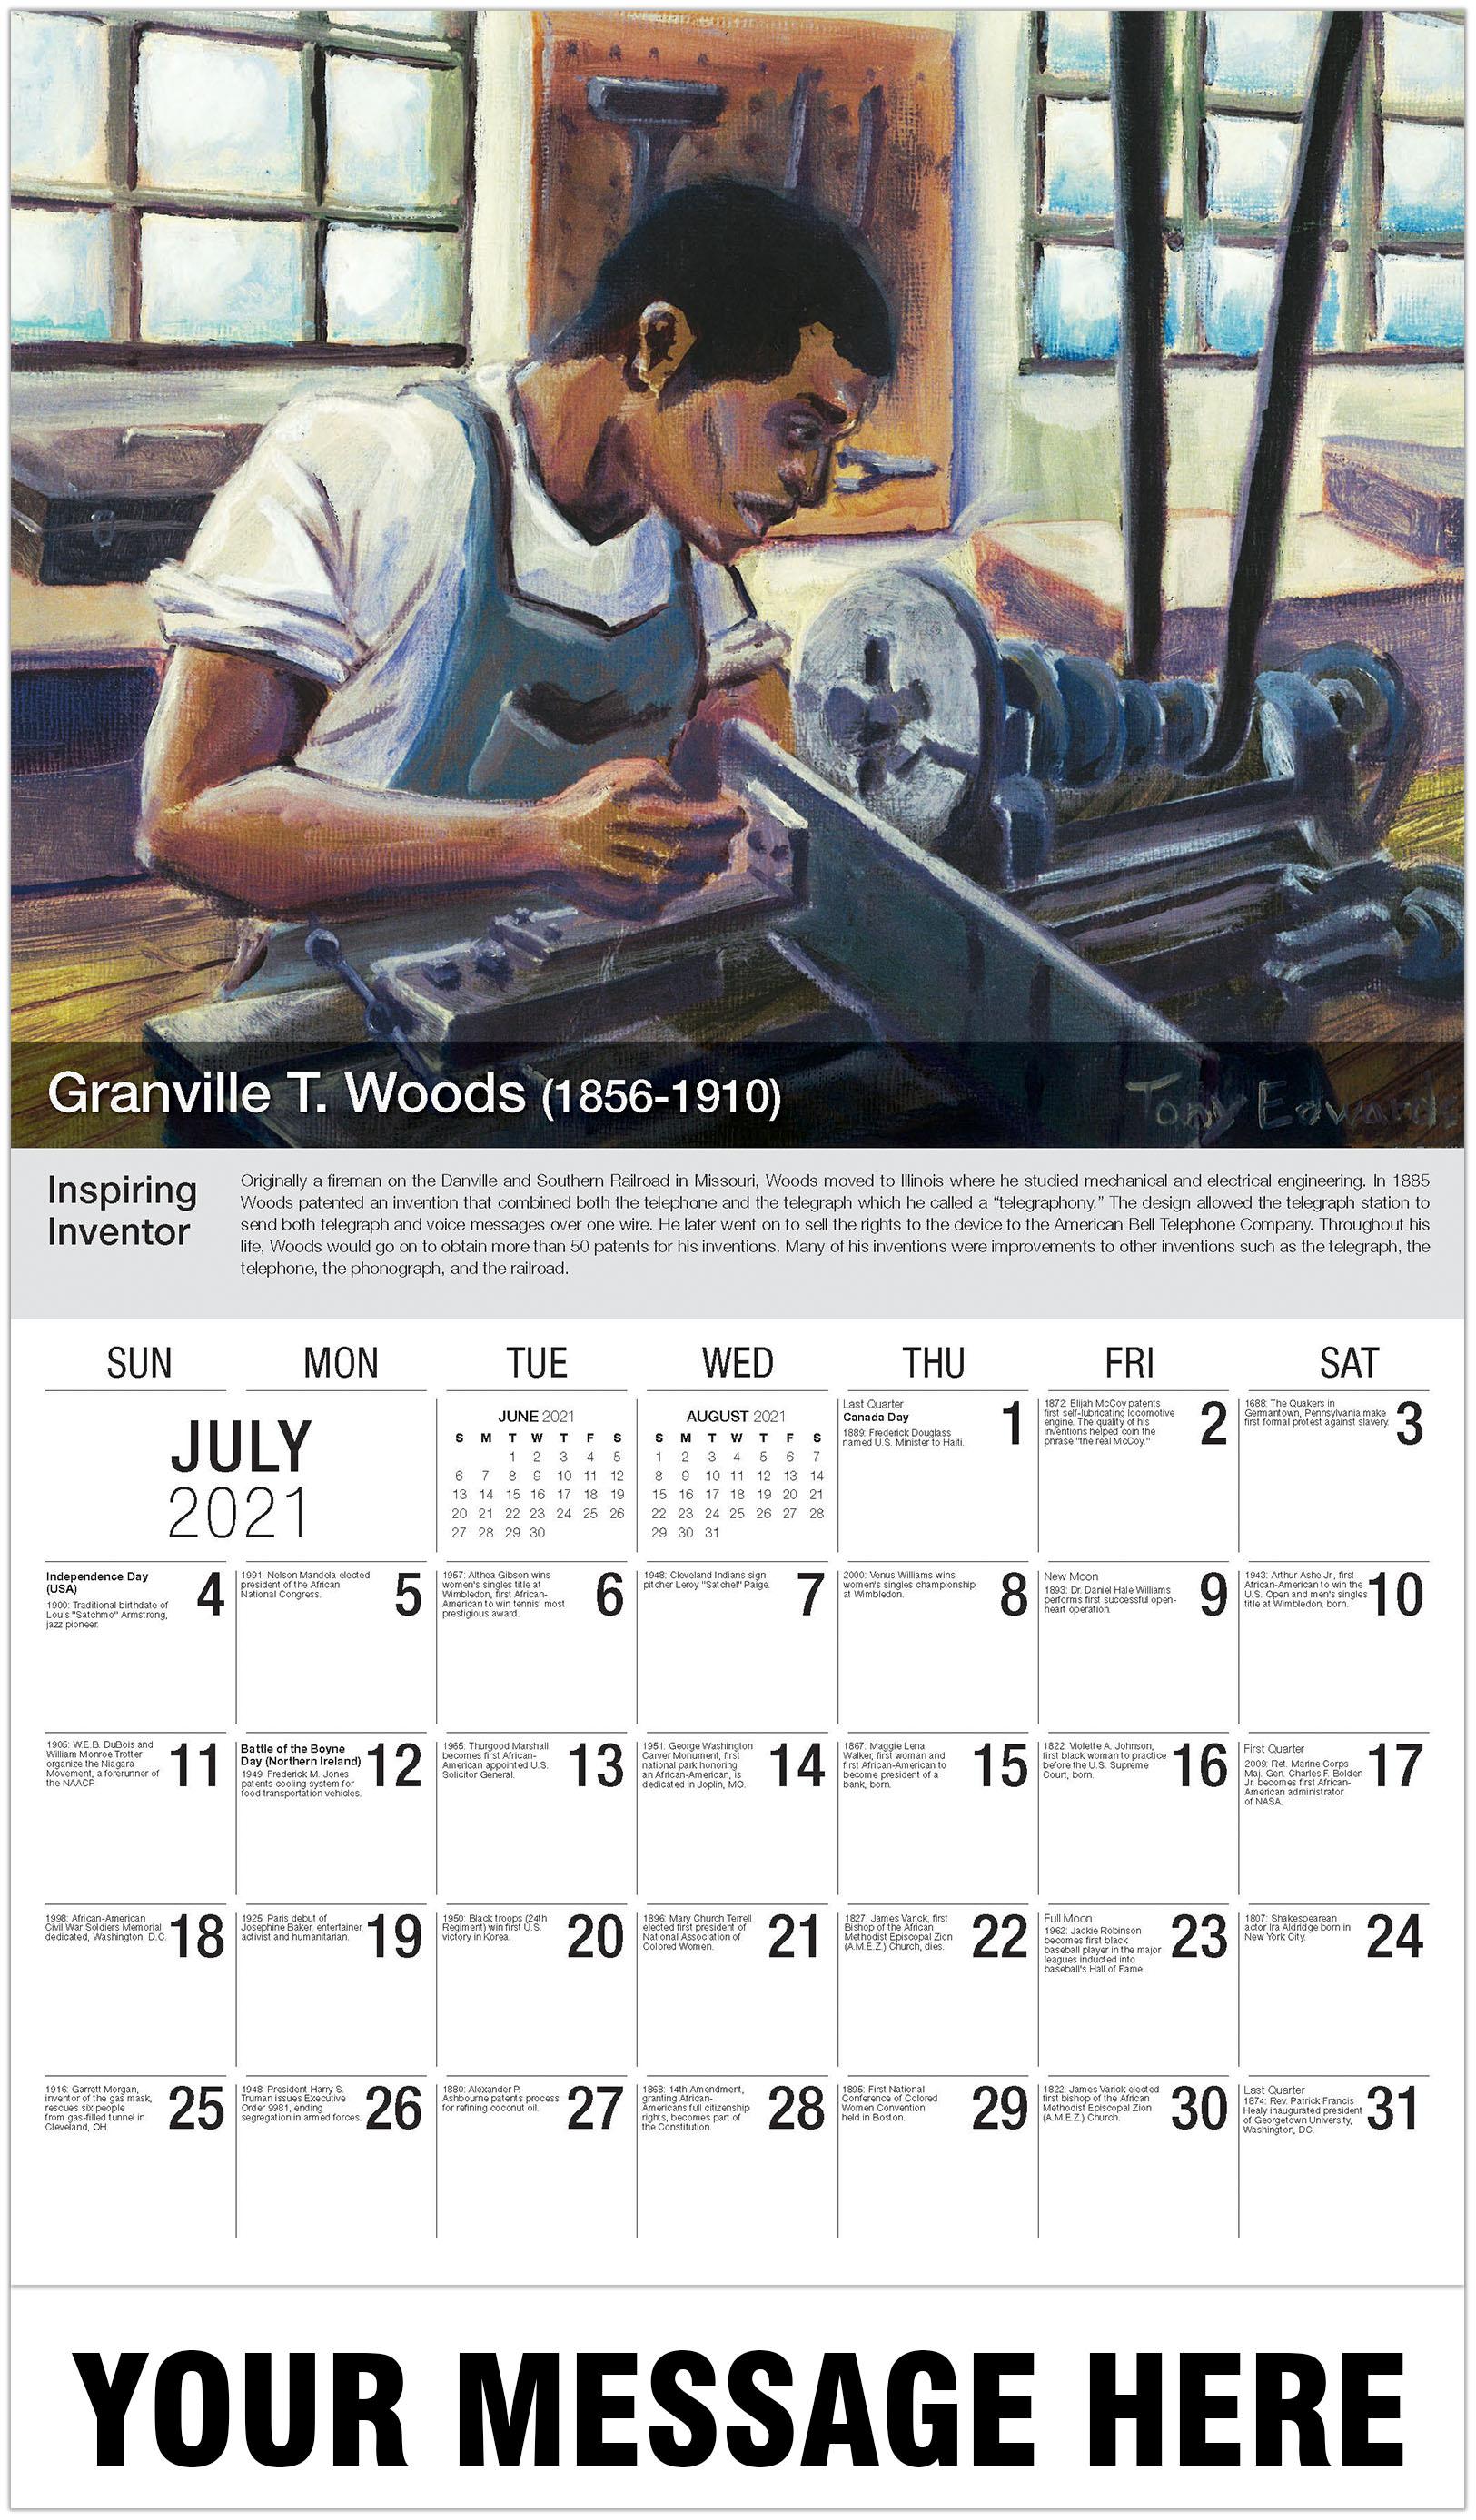 Granville T. Woods - July - Black History 2021 Promotional Calendar